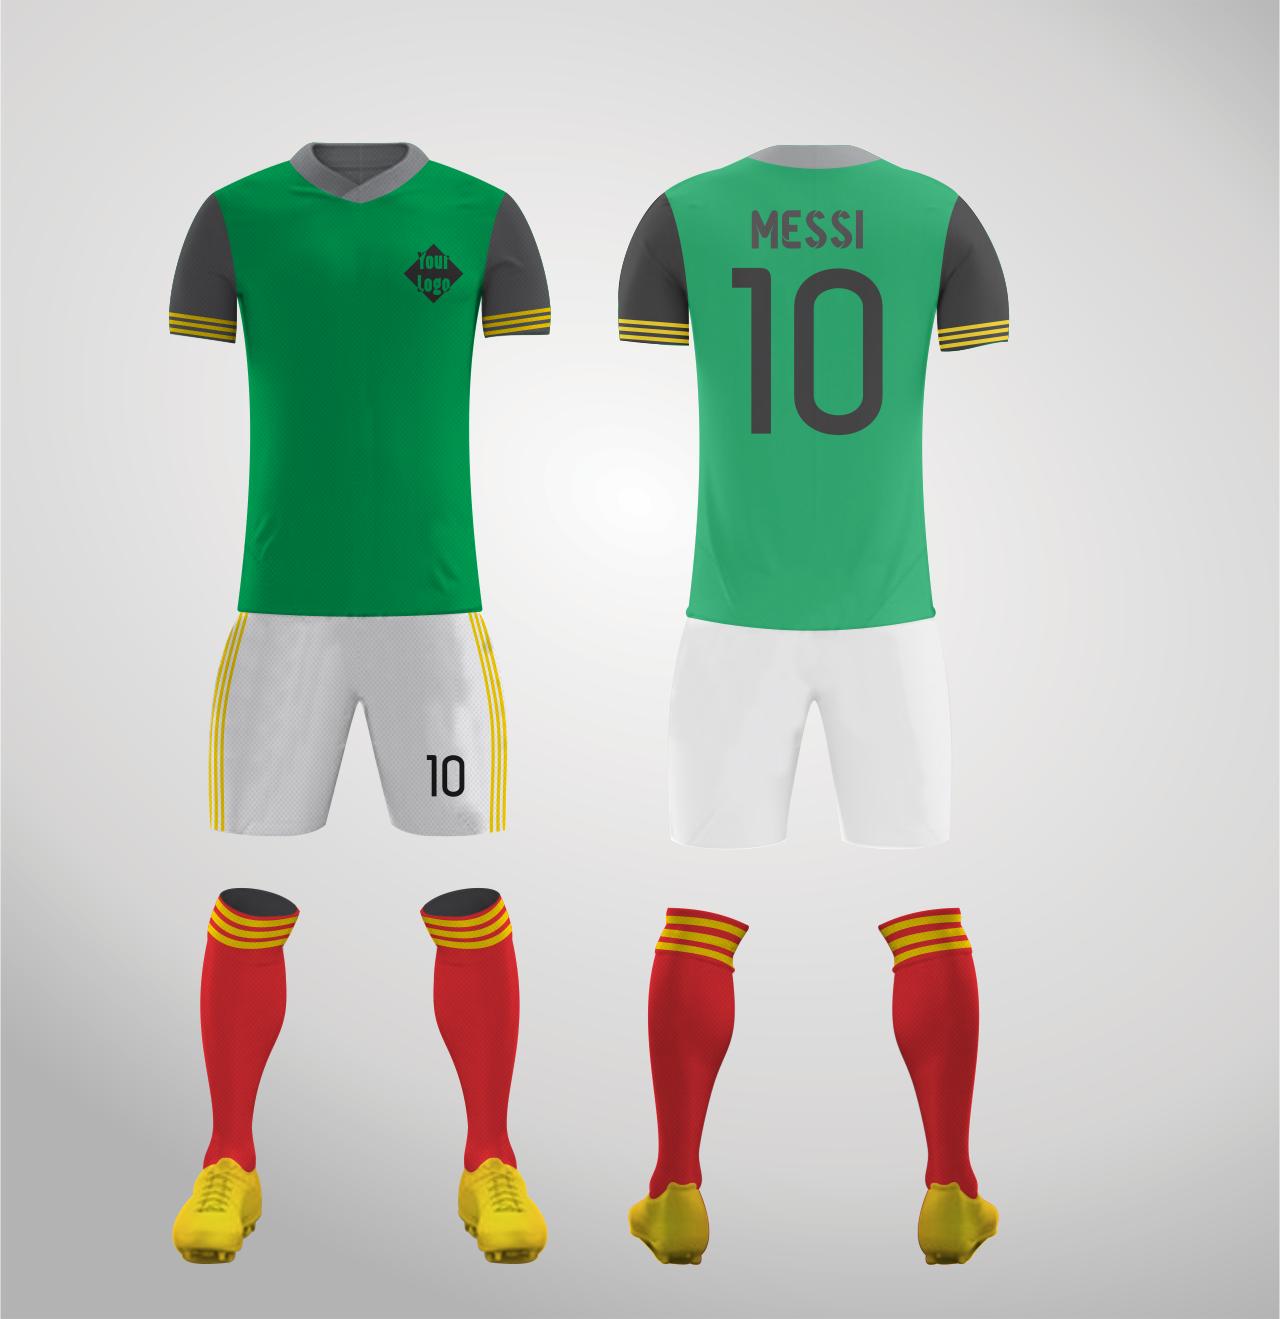 Mock up kaos cdr, mockup t shirt long sleeve, mock up kaos. Contoh Desain Baju Futsal Terbaik Dengan Format Cdr Desain Free